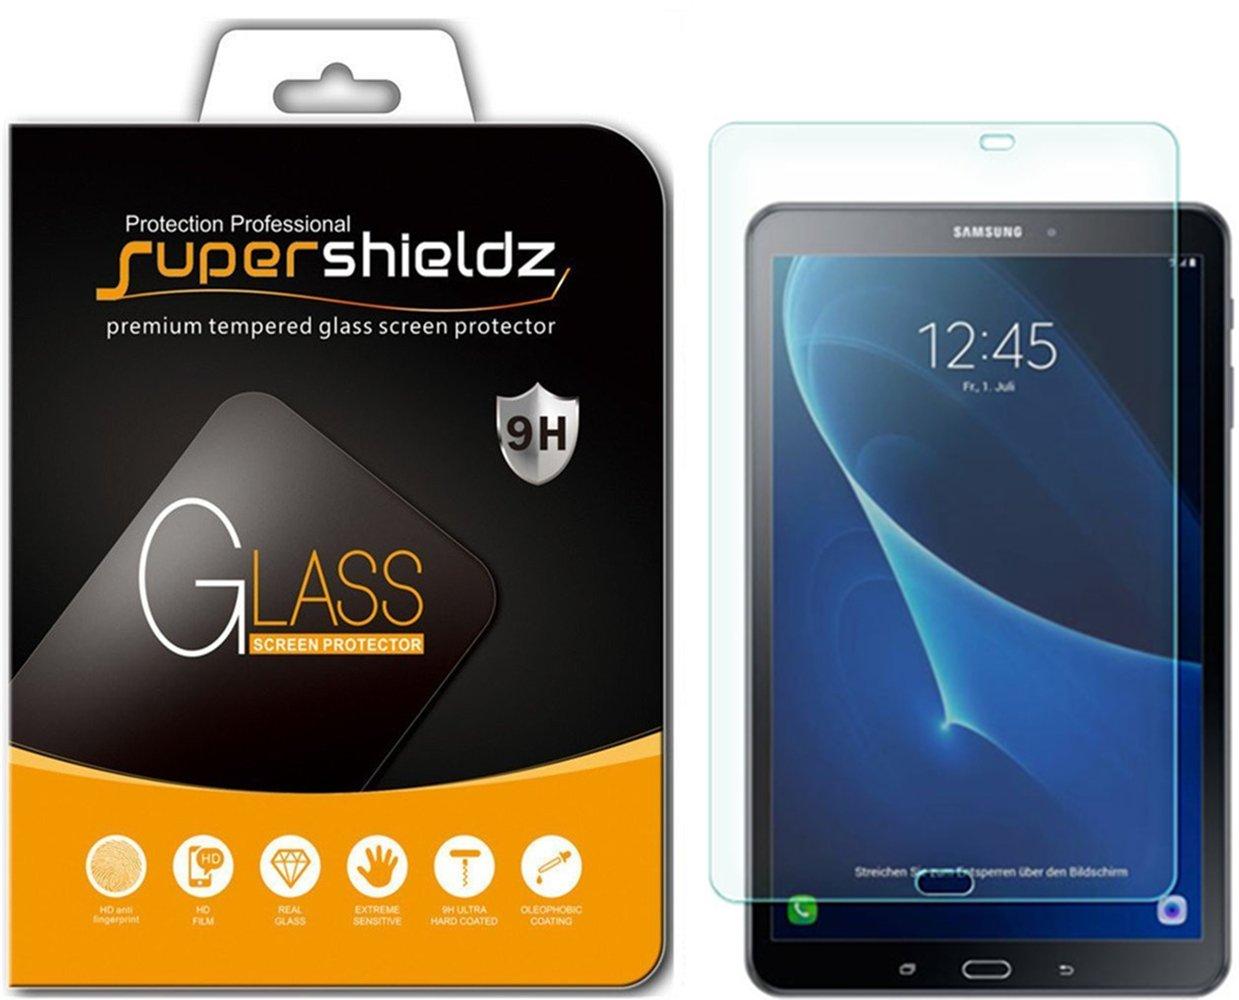 Vidrio Templado Samsung Galaxy Tab A 10.1 Sm-t580 (oferta)